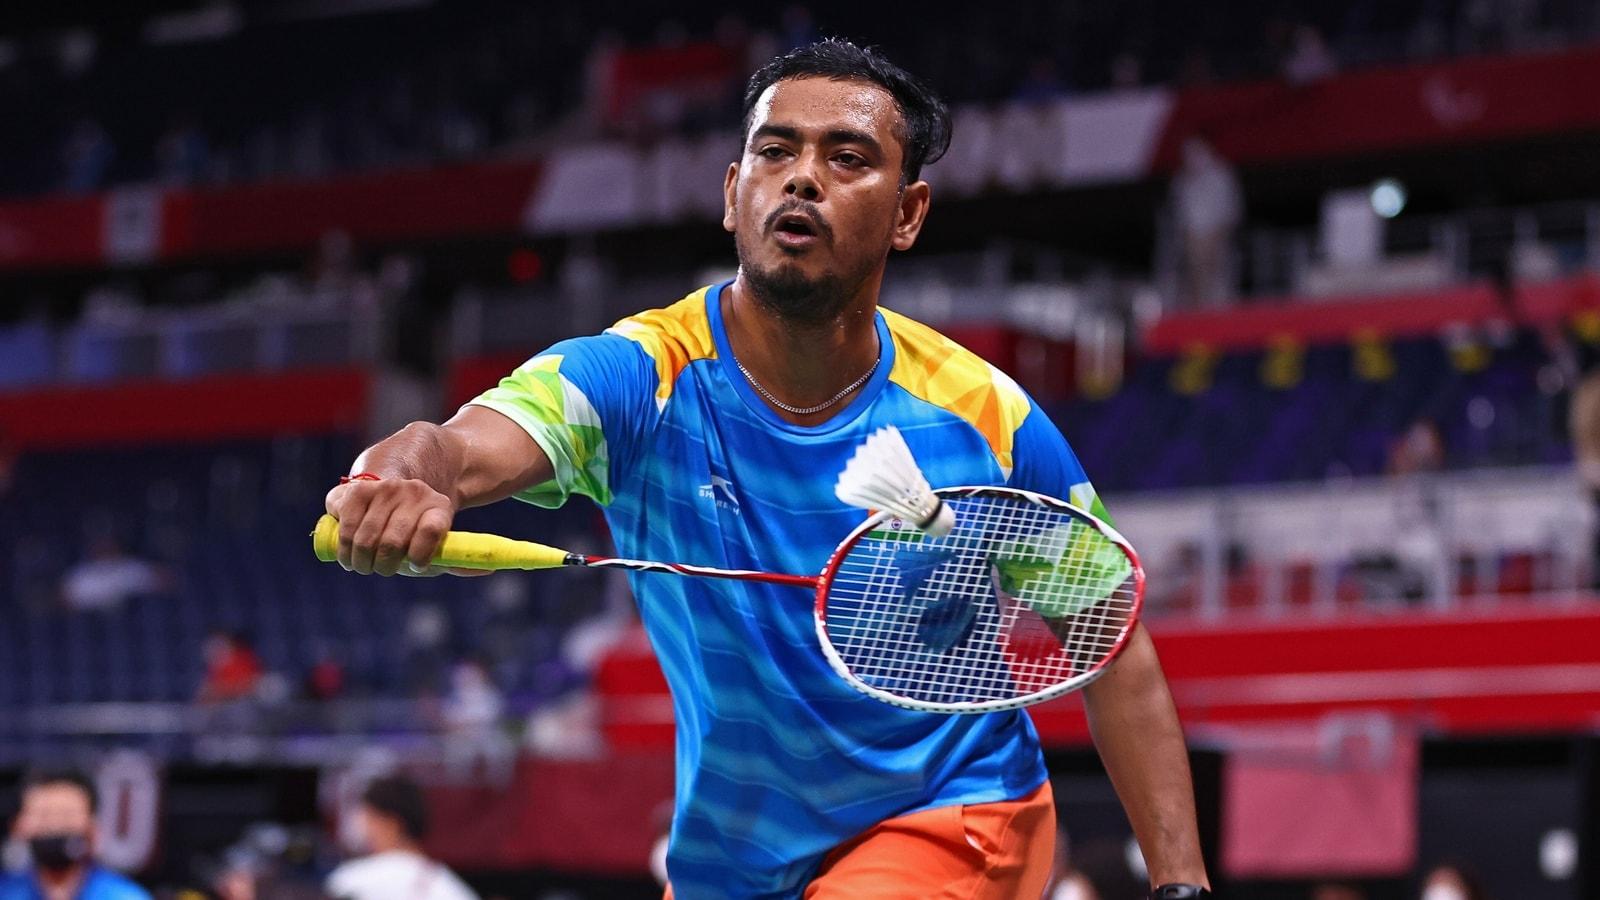 Tokyo Paralympics: India's Manoj Sarkar wins bronze in men's singles (SL3)  badminton event   Olympics - Hindustan Times